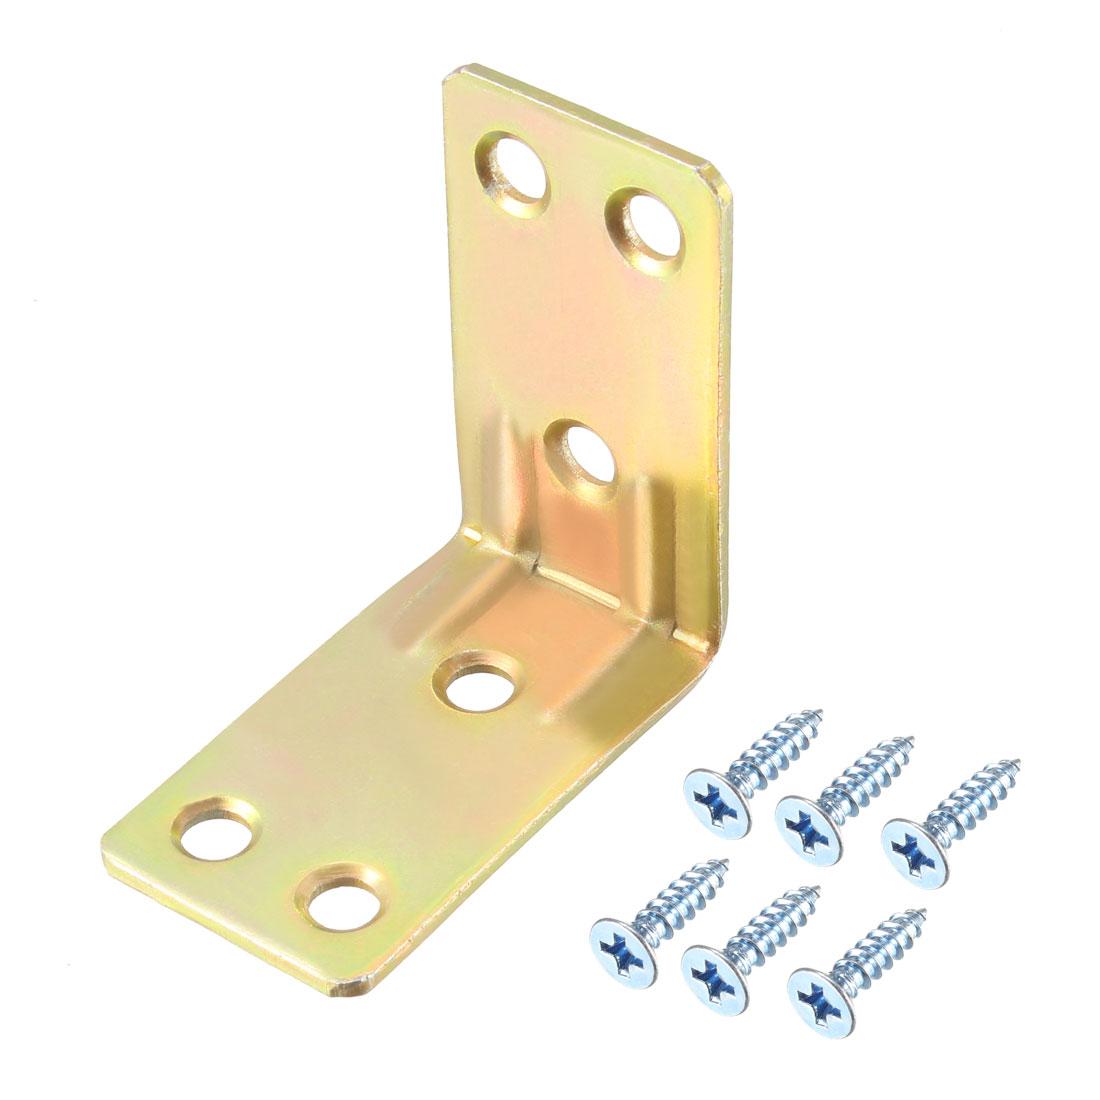 Corner Brace, 42mm x 42mm Zinc Plated Joint Right Angle Bracket w Screws, 20 Pcs